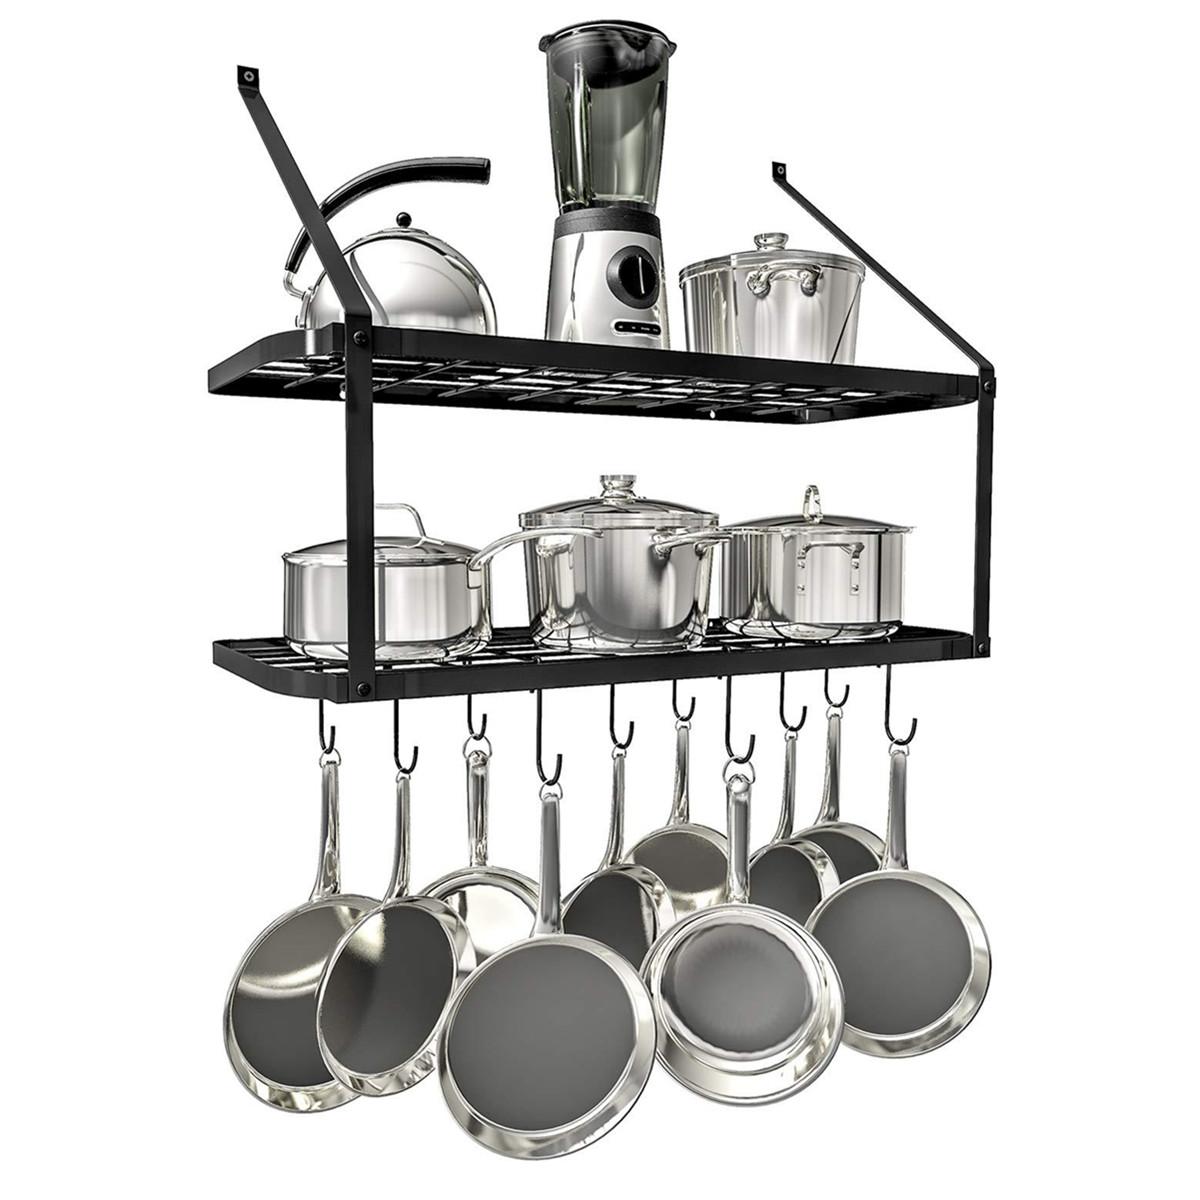 2 tier kitchen hanging pan pot rack wall mounted storage shelf with 10 hook